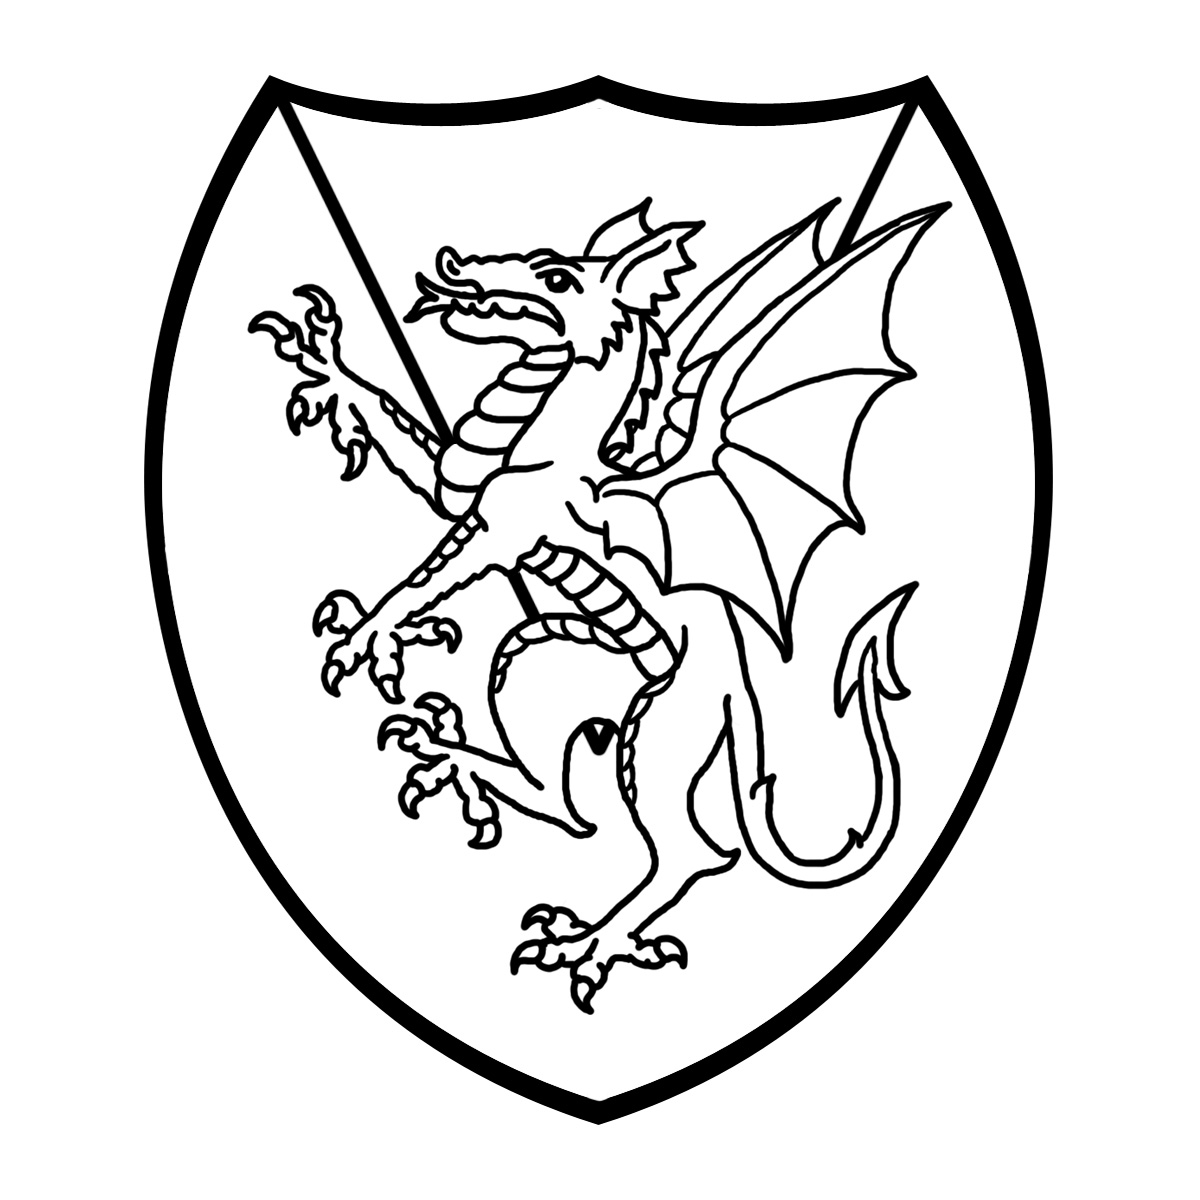 Shield clipart medieval shield Knight Knight Clipart History: Clip